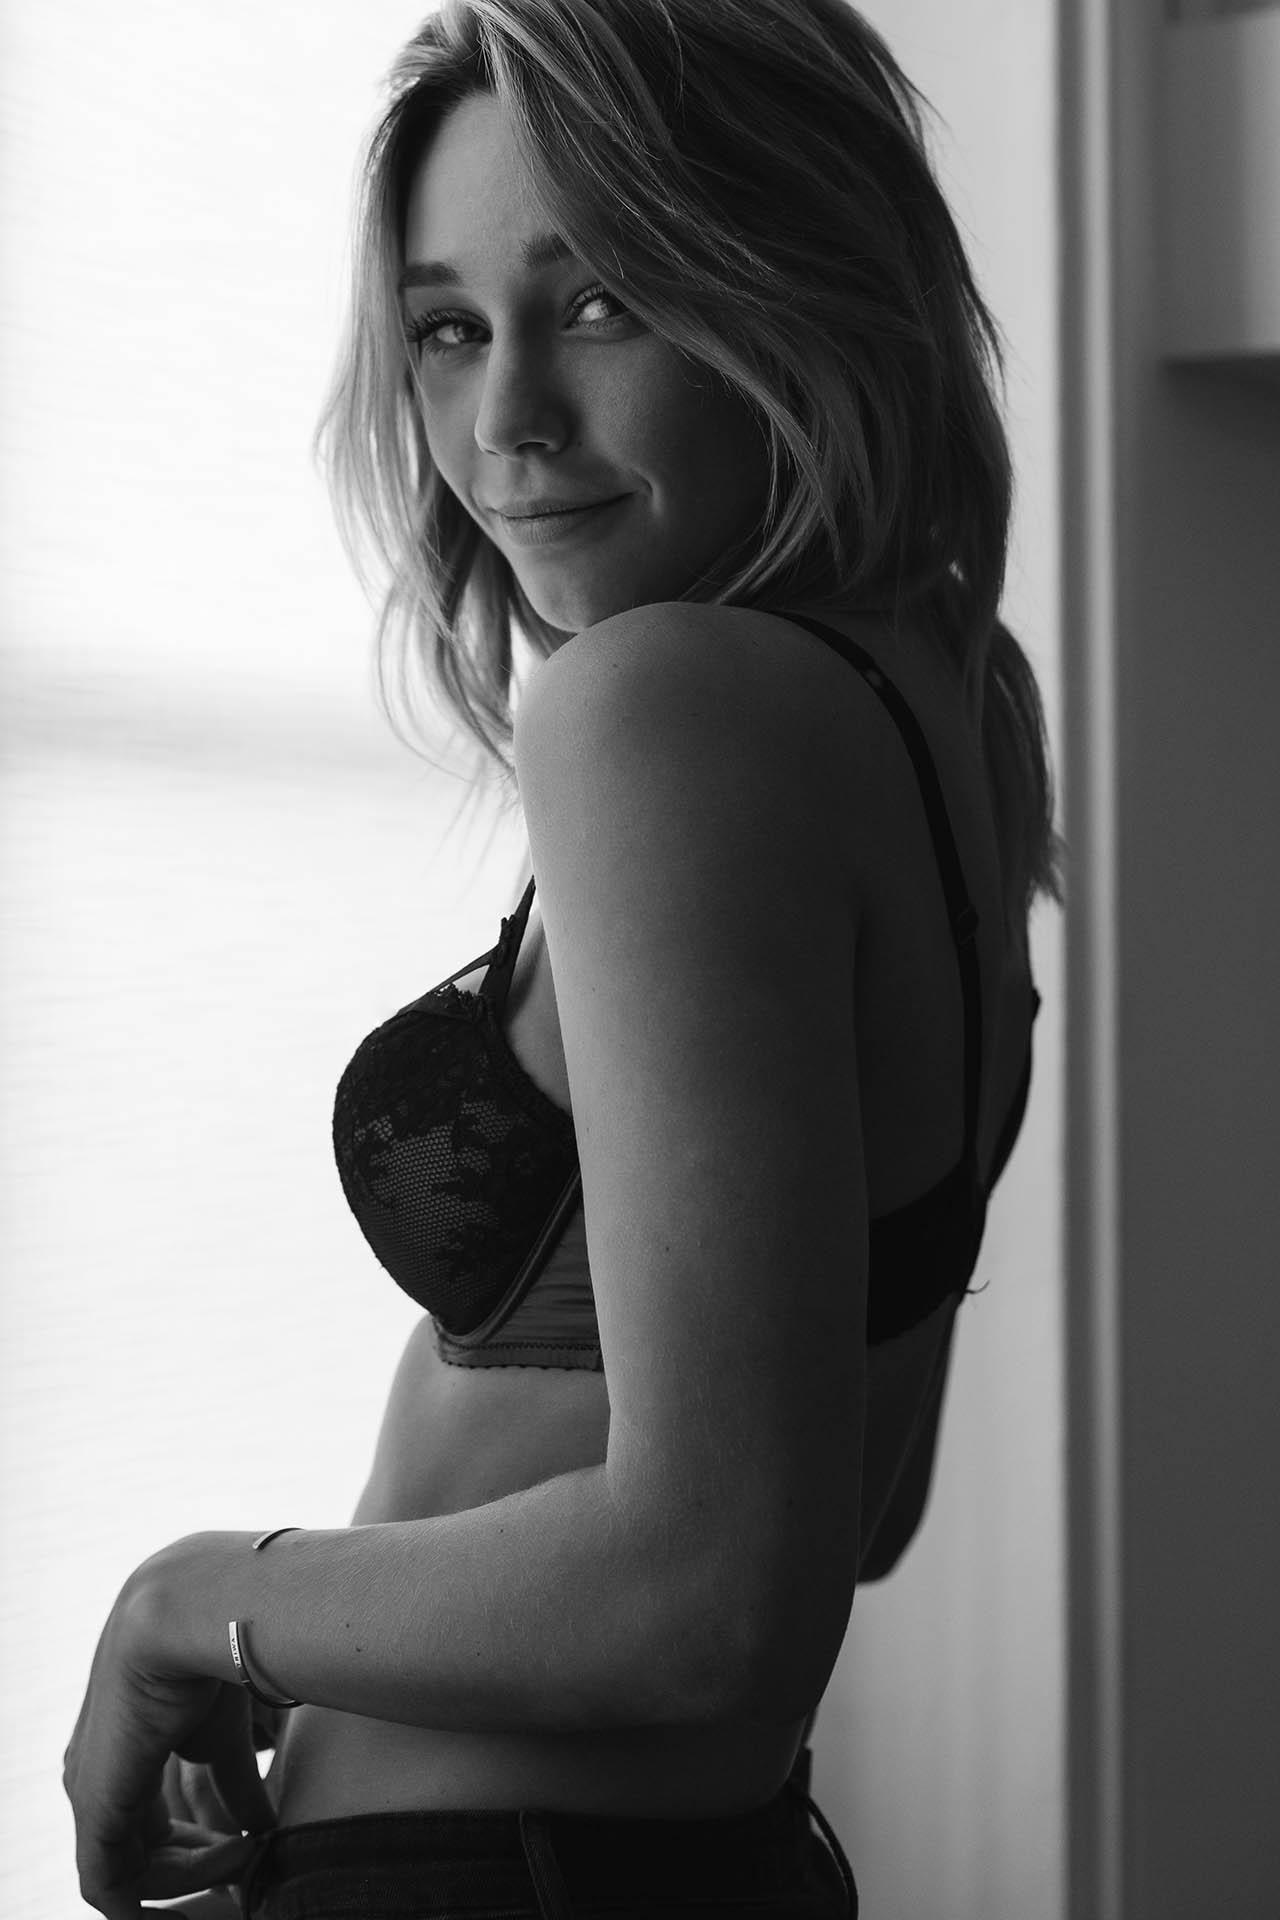 icemecri-Alison_Cossenet-lingerie-2